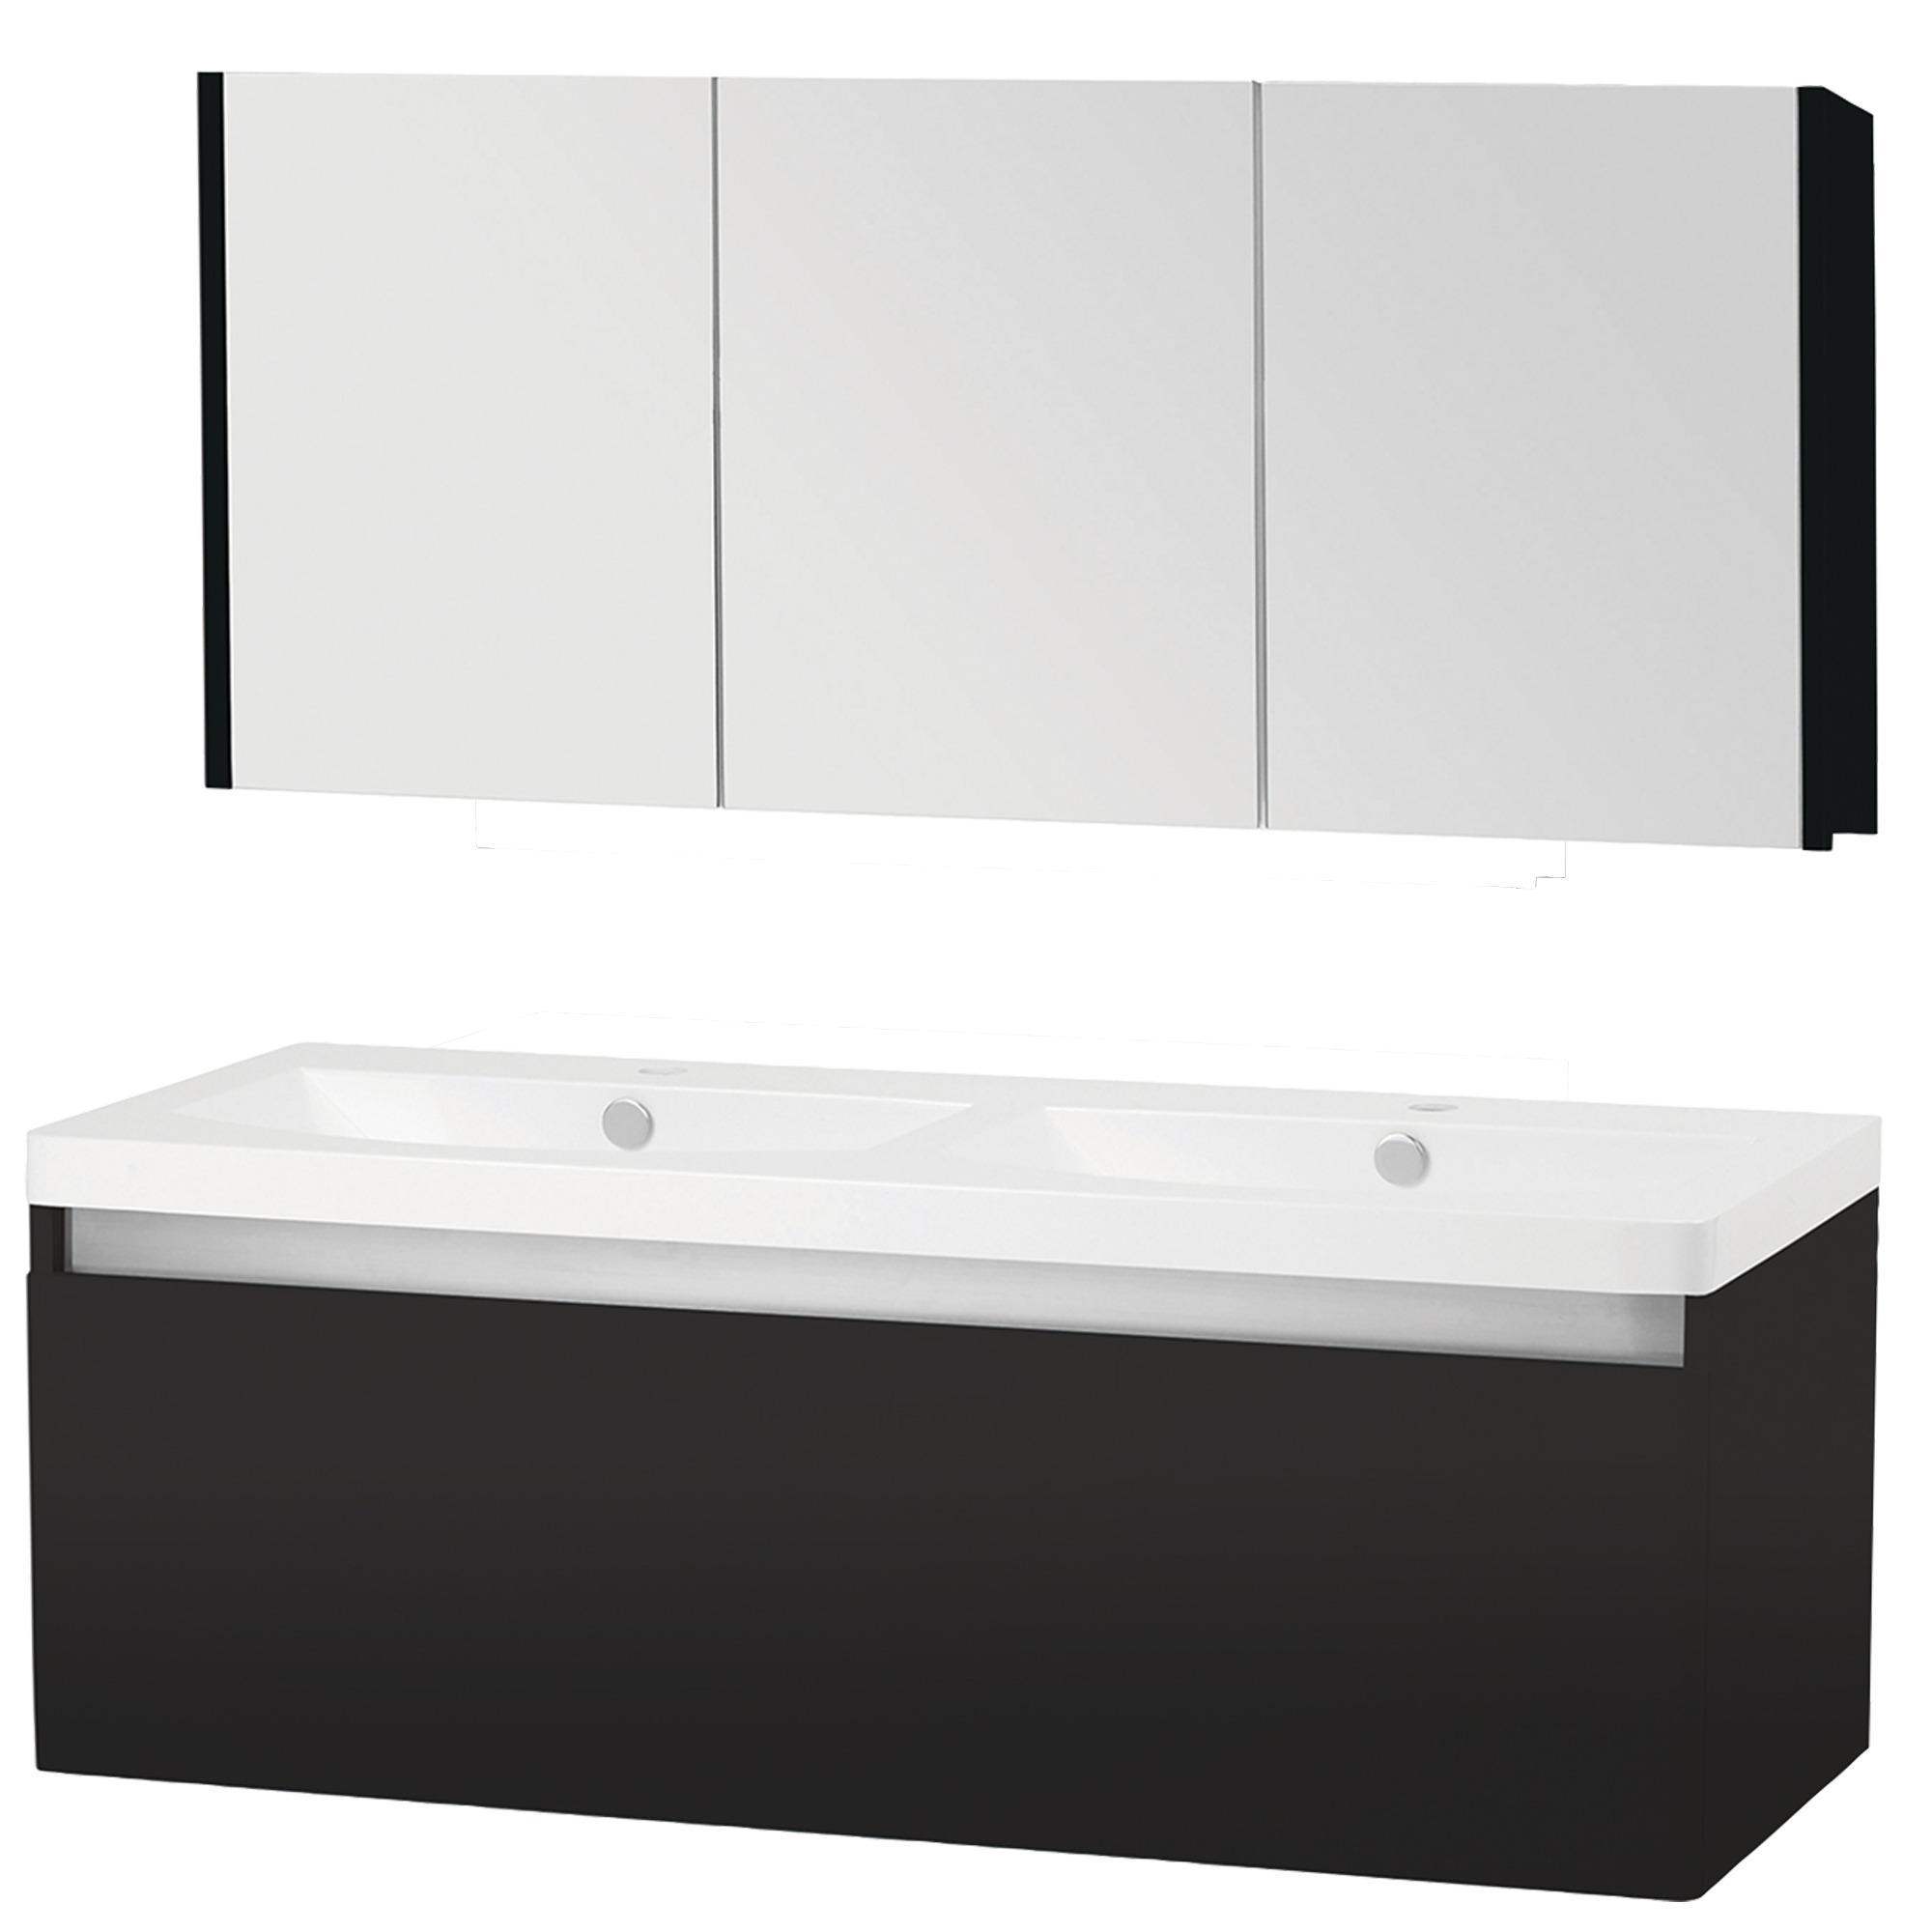 stripe badkamermeubelset hoogglans zwart 120 cm | badkamermeubelen, Badkamer